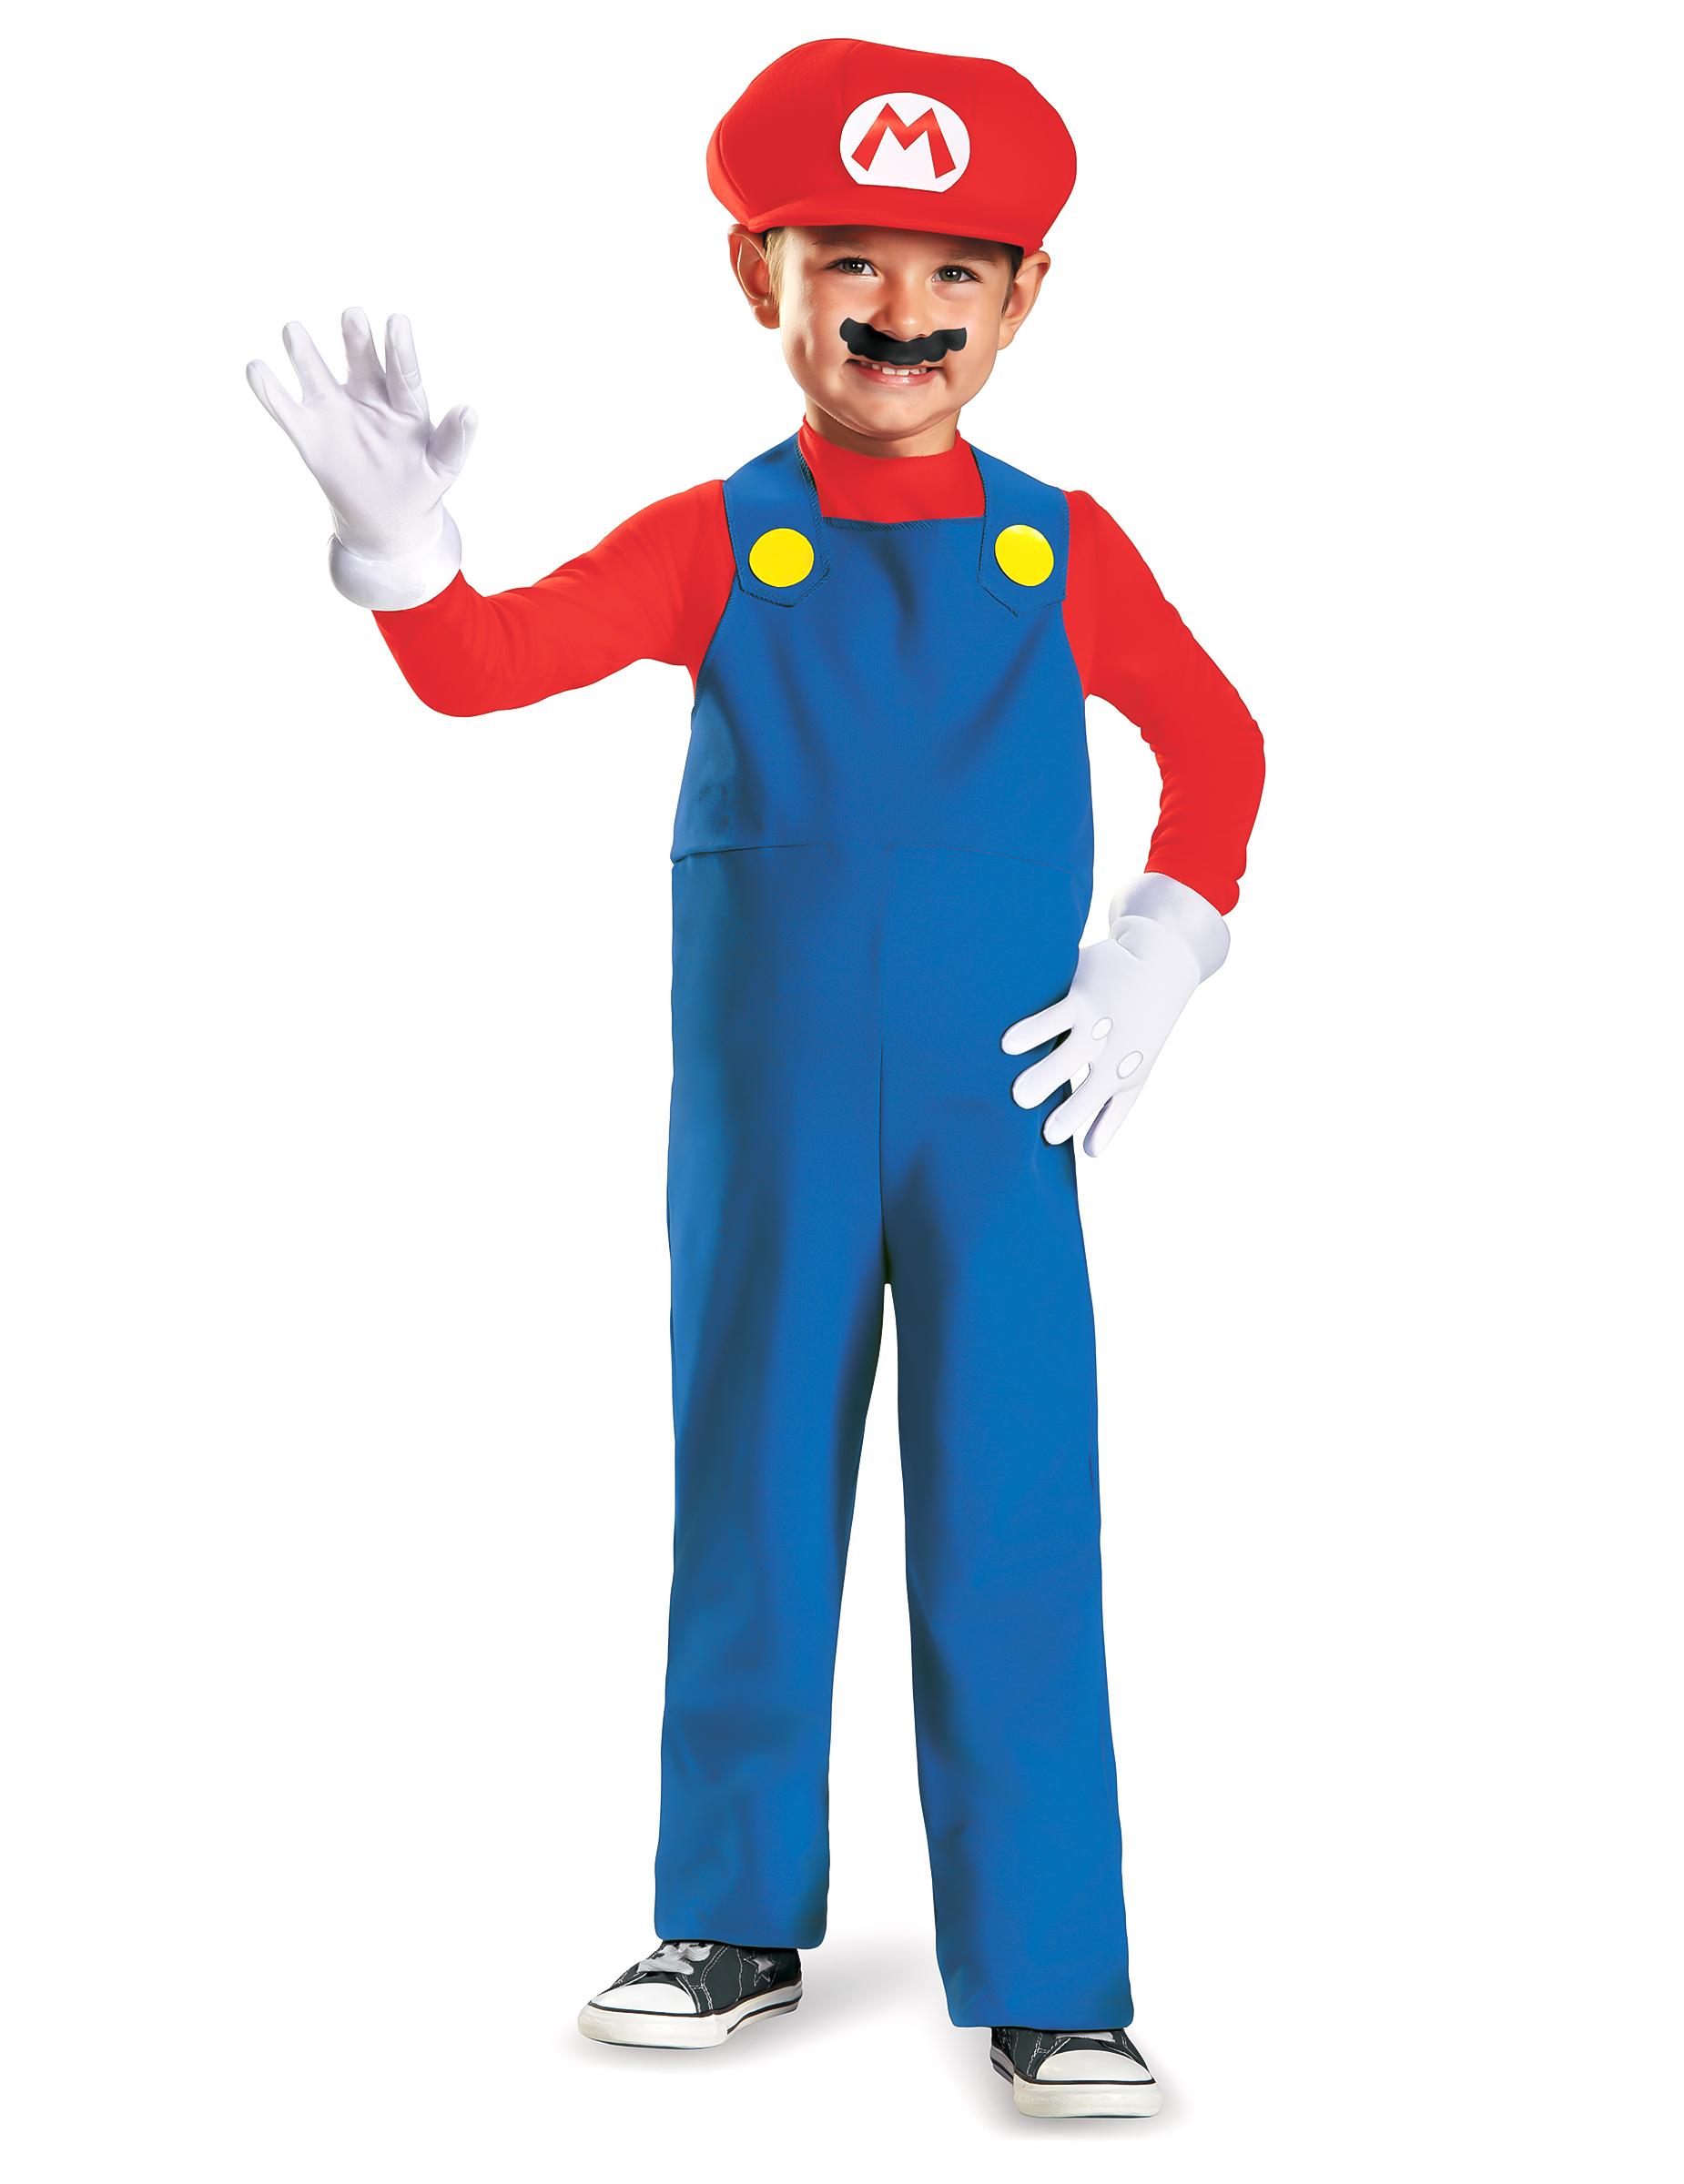 a1aac583a5fd92 Mario Kinderkostüm Super Mario Videospiel rot-blau-weiss , günstige ...